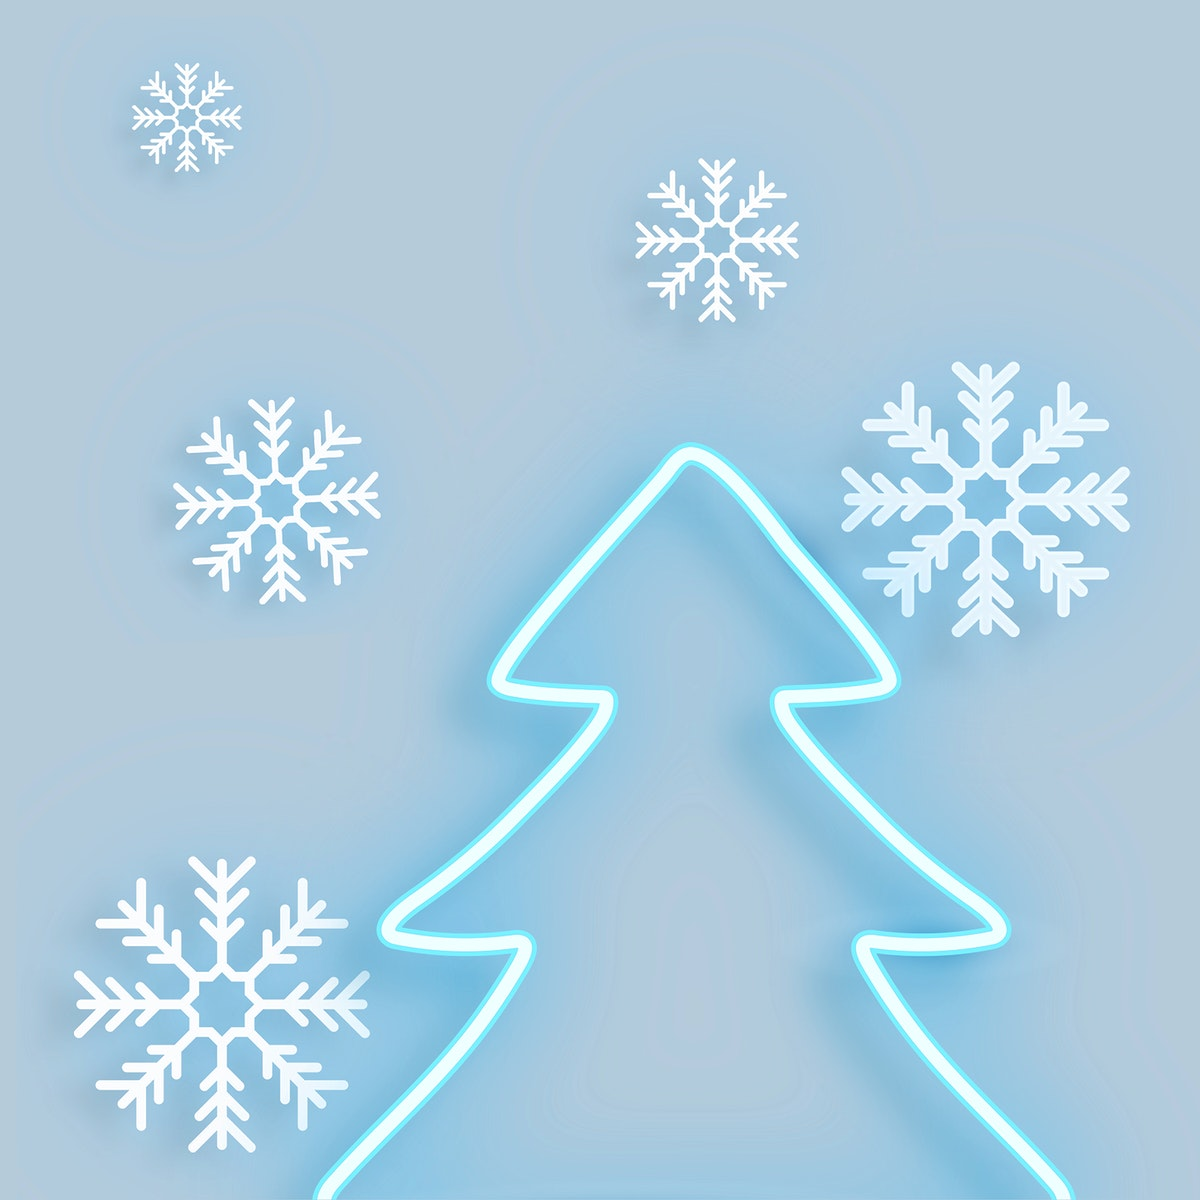 Blue neon Christmas tree illustration